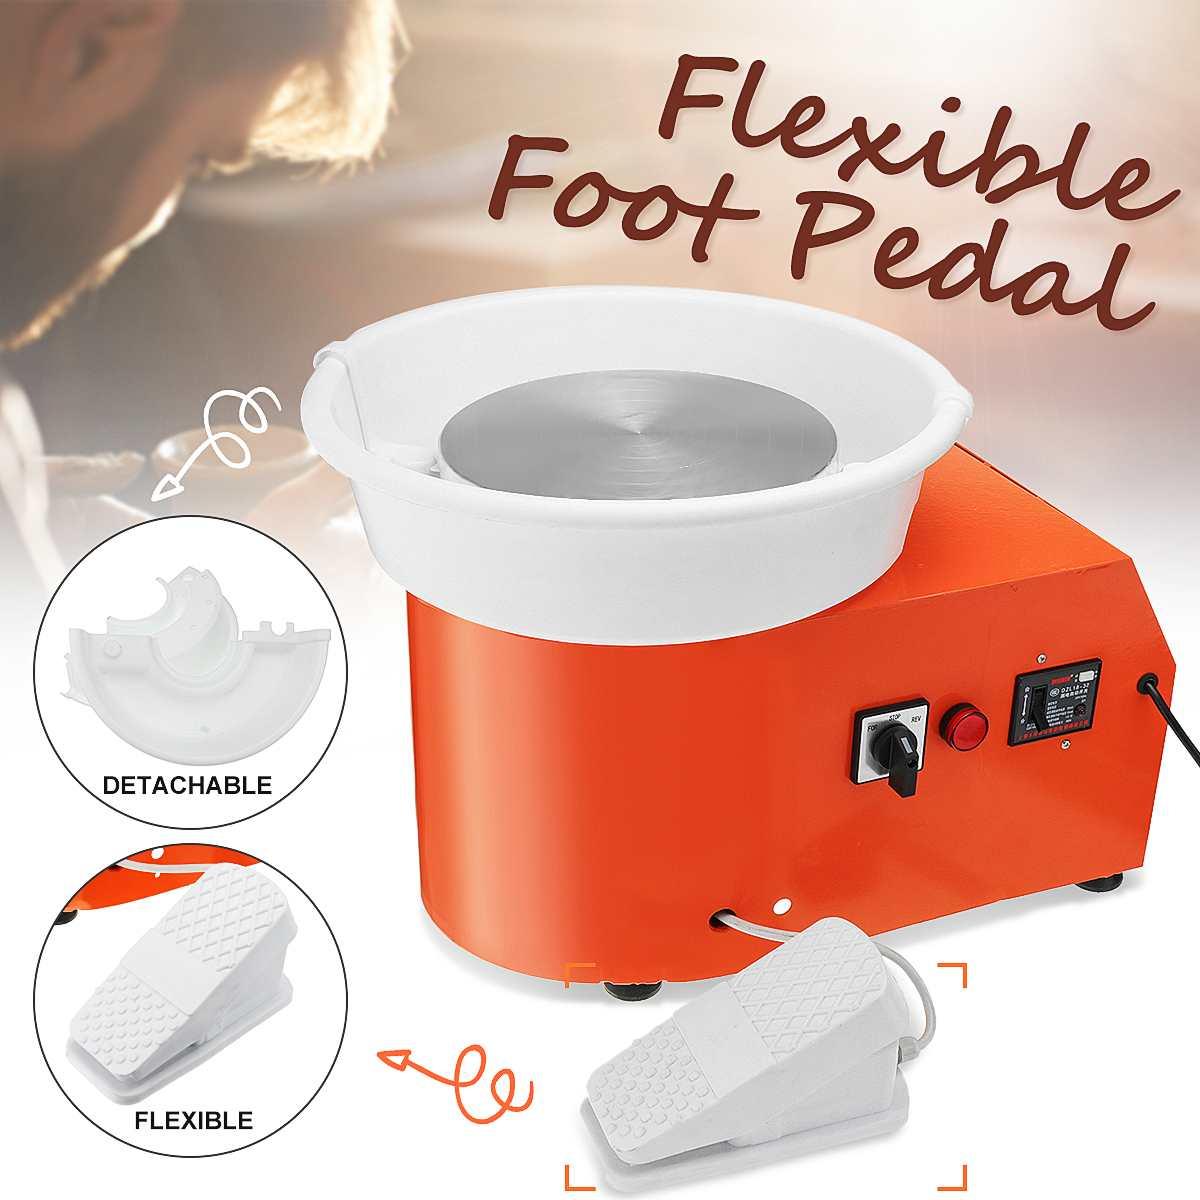 Pottery Wheel Machine Ceramic Work Ceramics Clay DIY Clay Tool Art With Flexible Foot Pedal 220V AU Plug 350W Detachable Forming